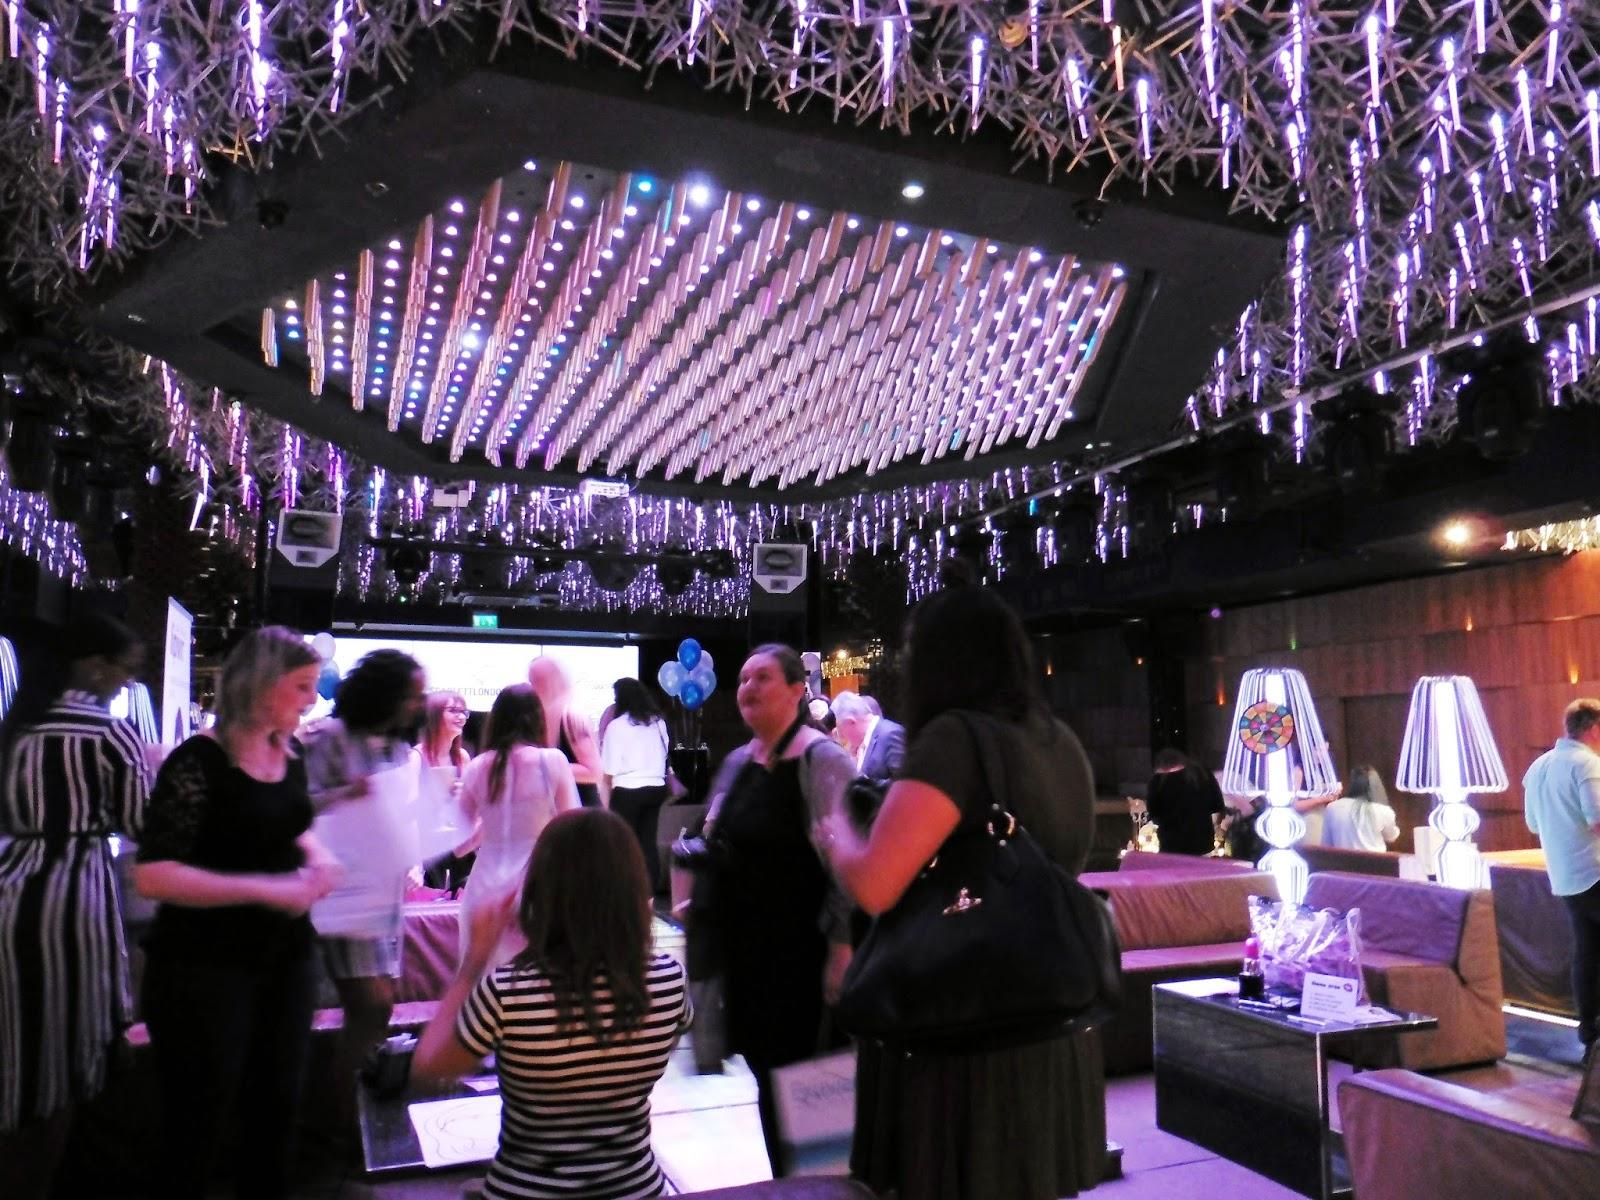 lebellelavie - The Bloggers Ball hosted by Scarlett London